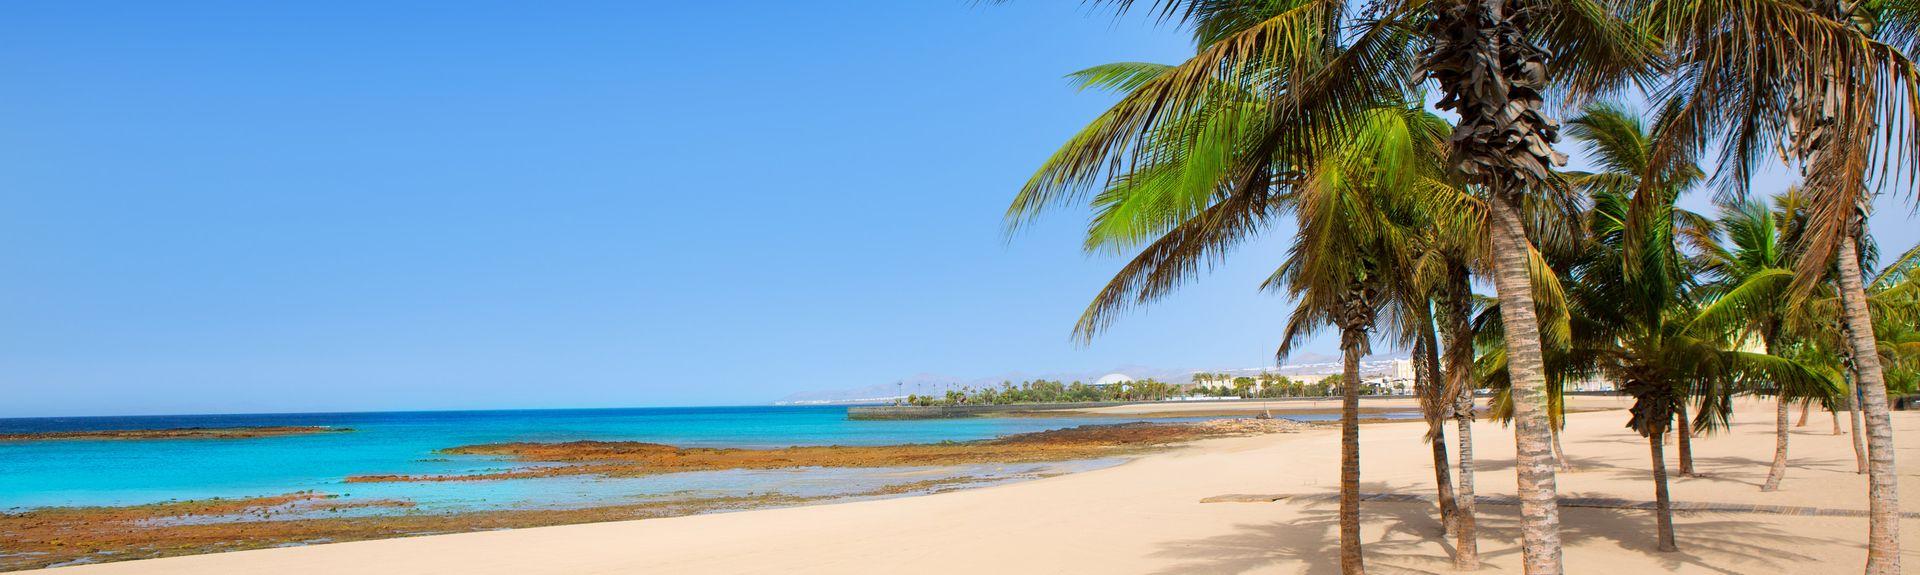 Arrecife, Canarische Eilanden, Spanje